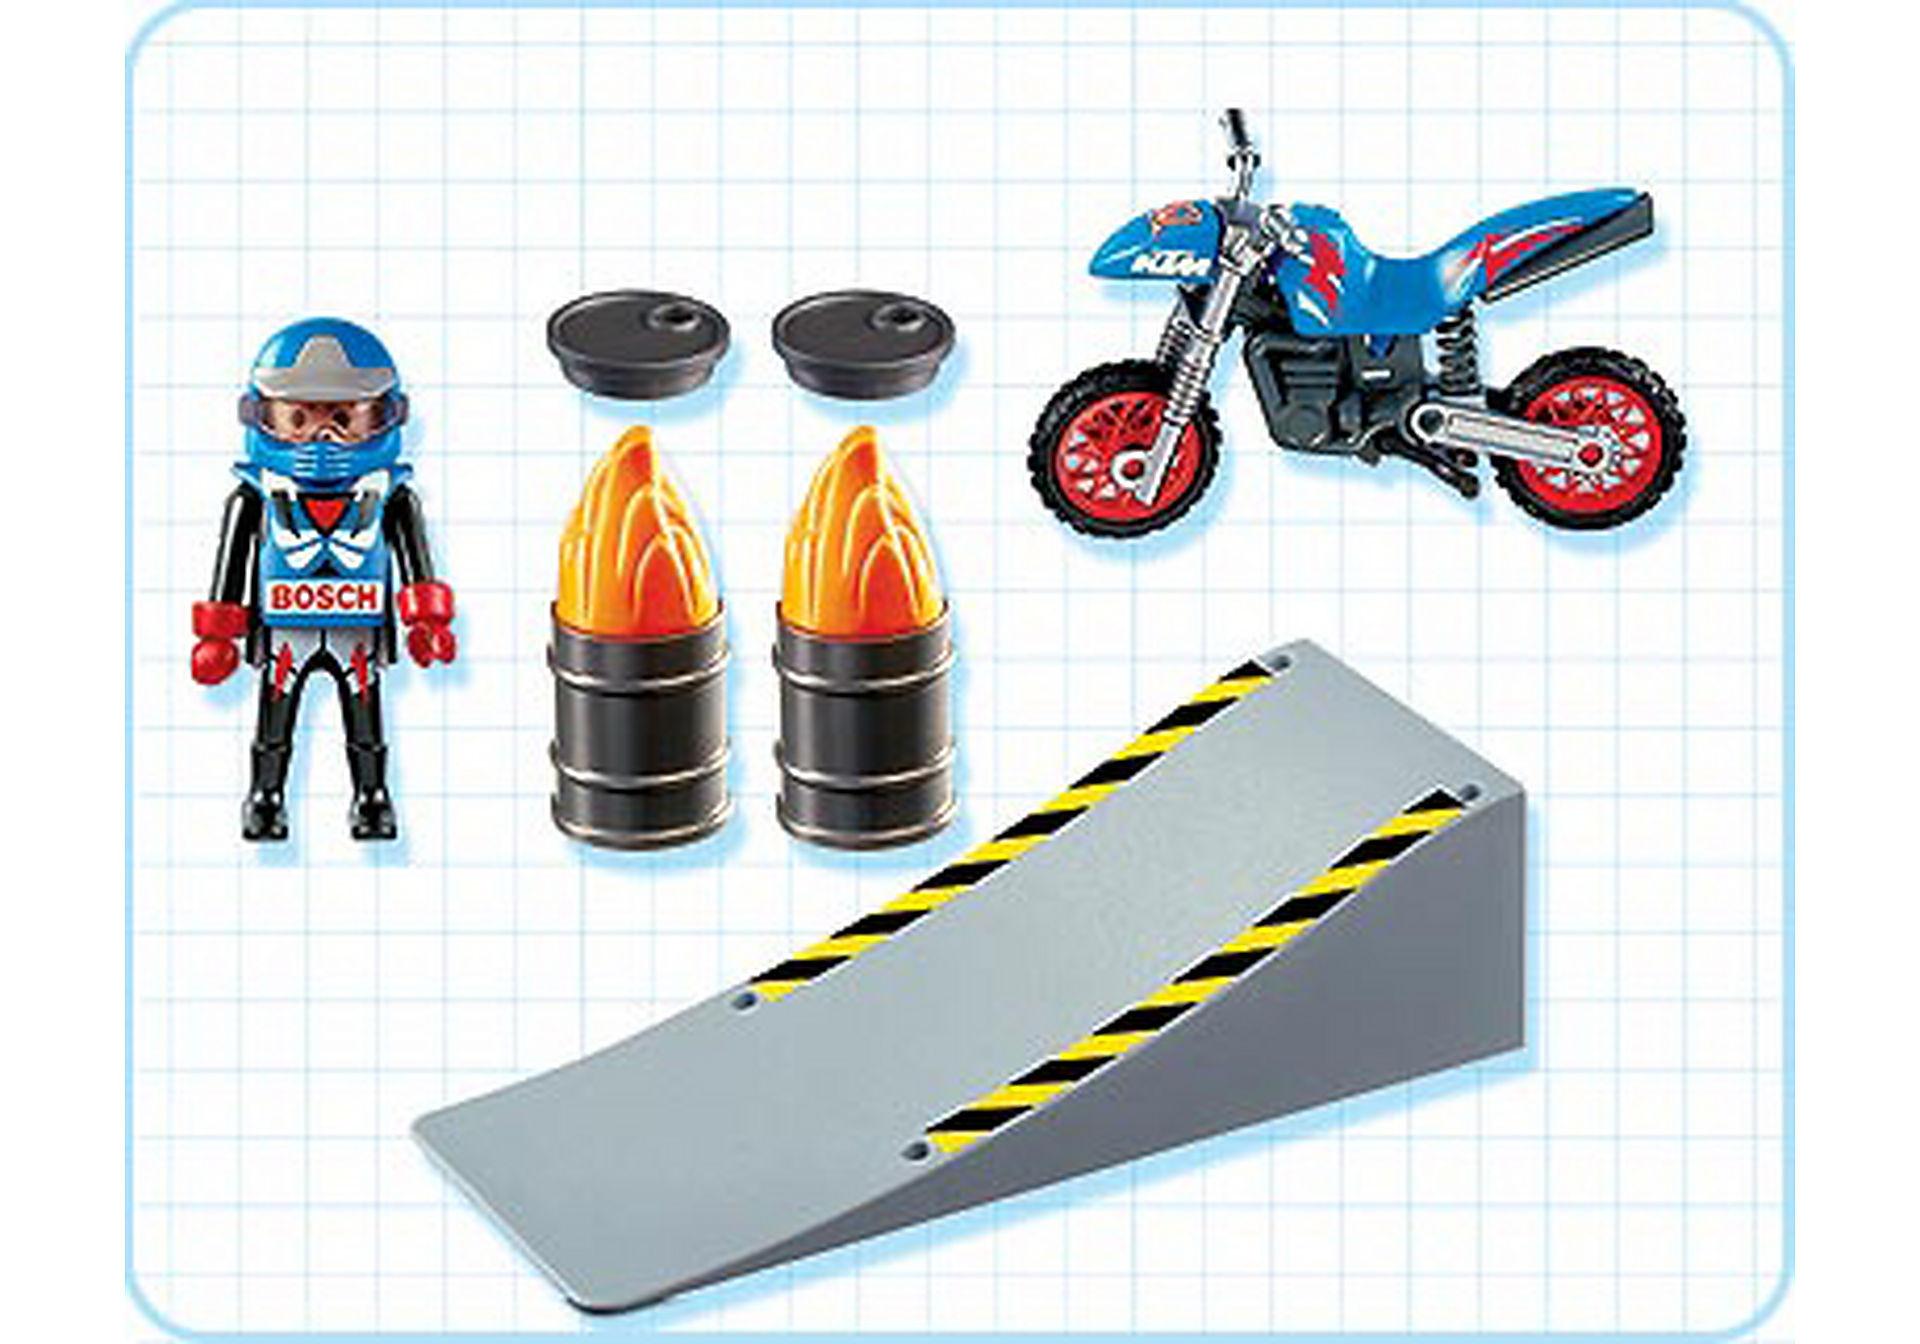 4416-A Motocross-Fahrer mit Rampe zoom image2